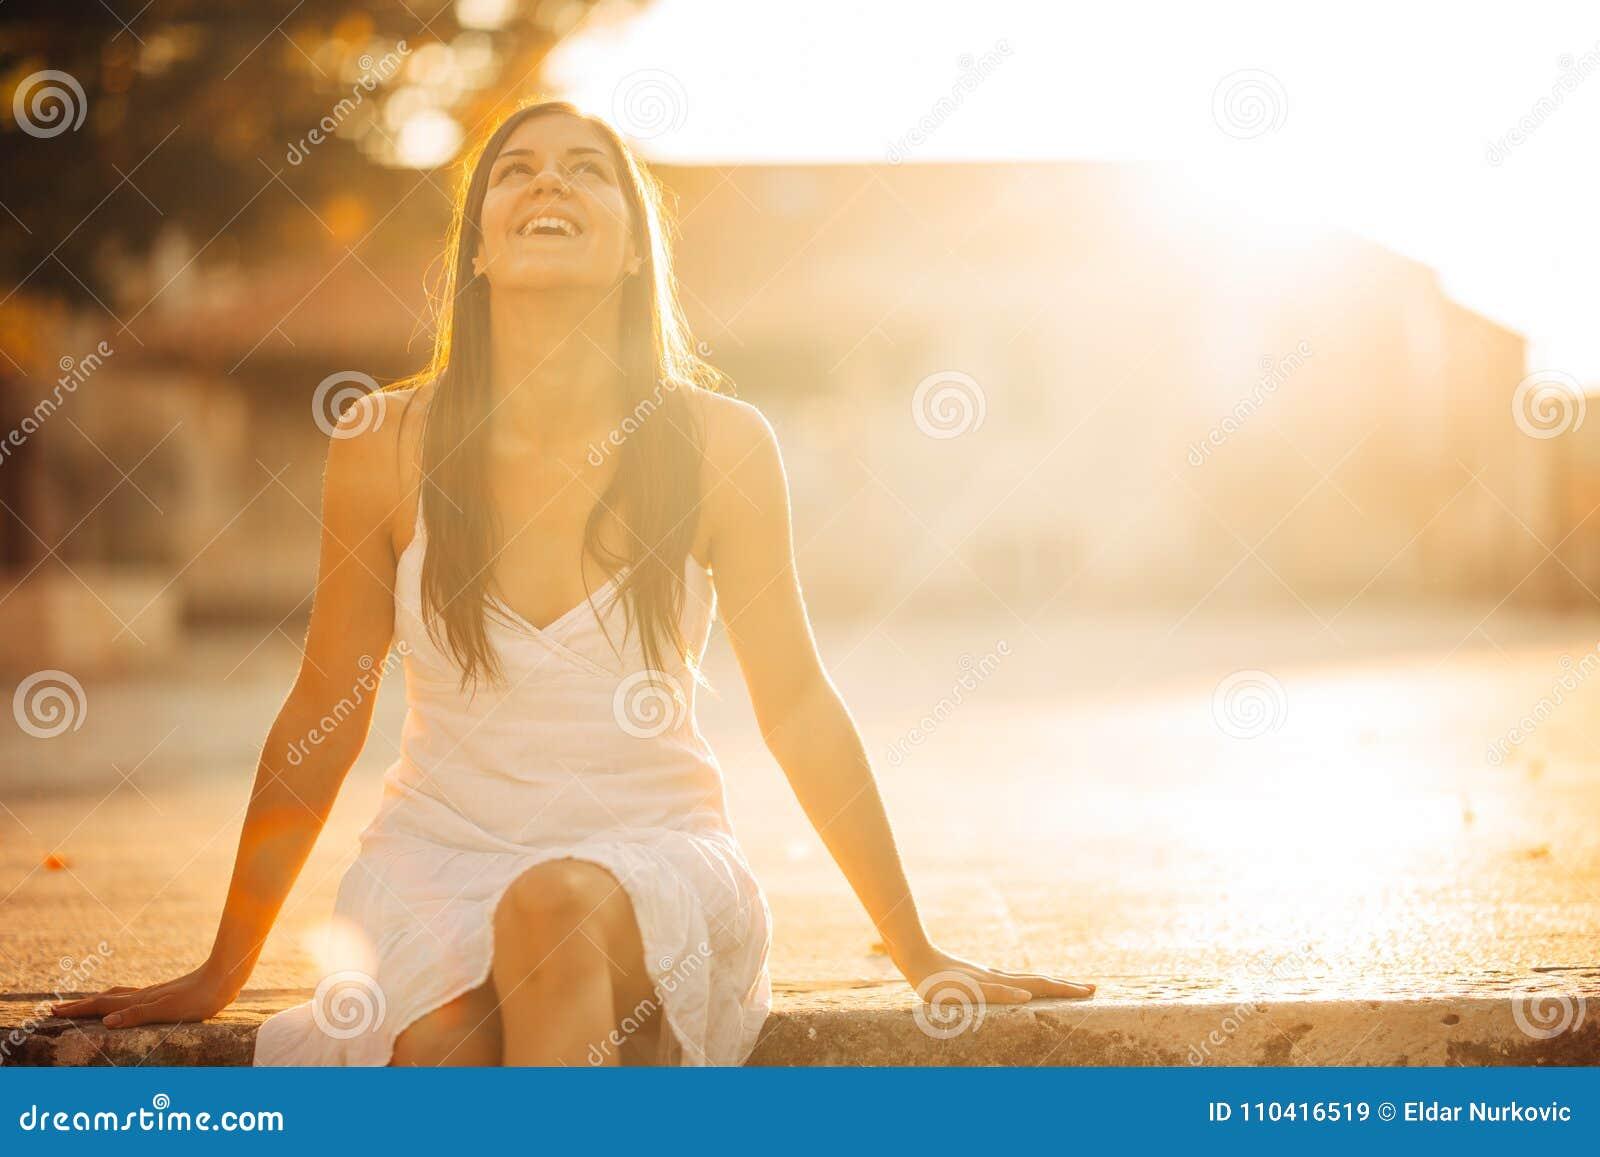 Carefree woman enjoying in nature,beautiful red sunset sunshine.Finding inner peace.Spiritual healing lifestyle.Enjoying peace,ant